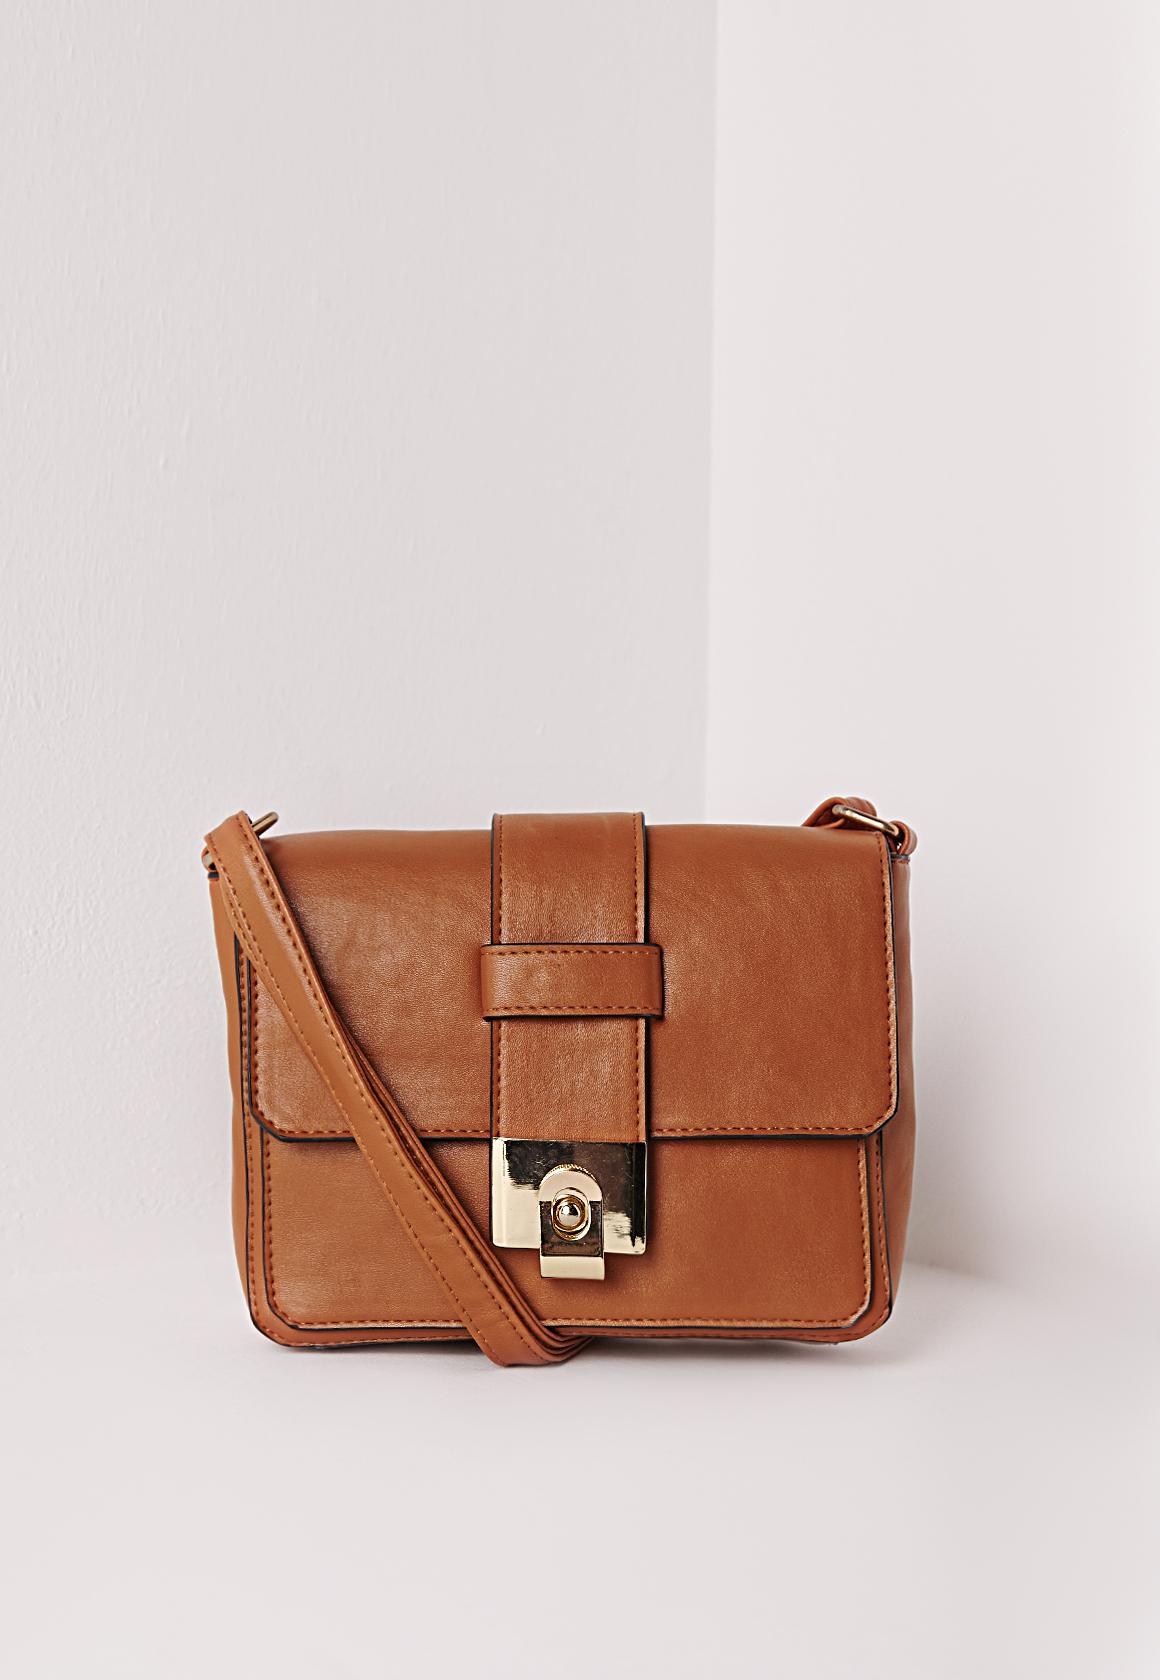 Missguided Mini Buckle Crossbody Bag Tan in Brown